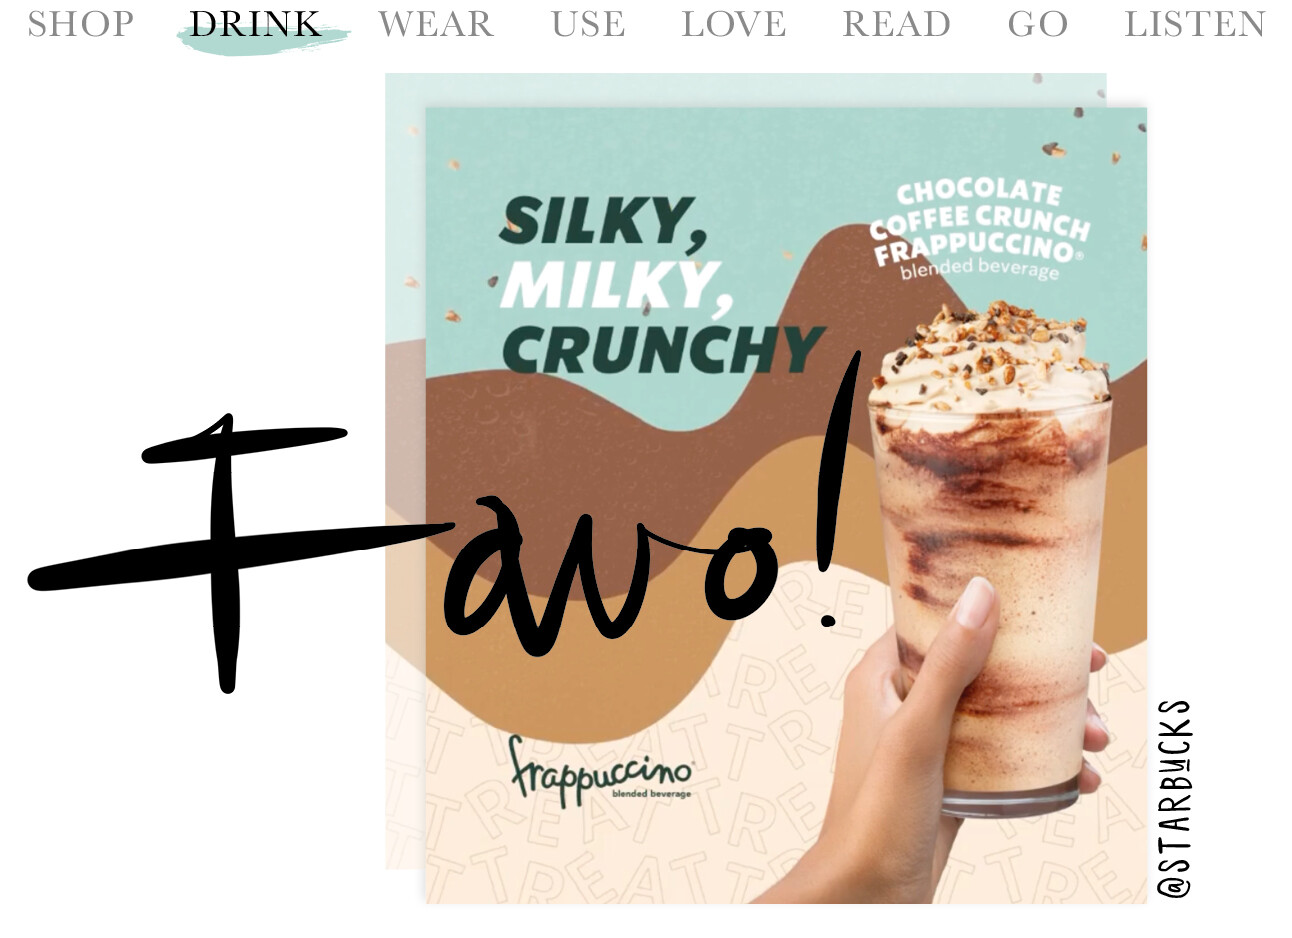 today we drink the new Starbucks taste